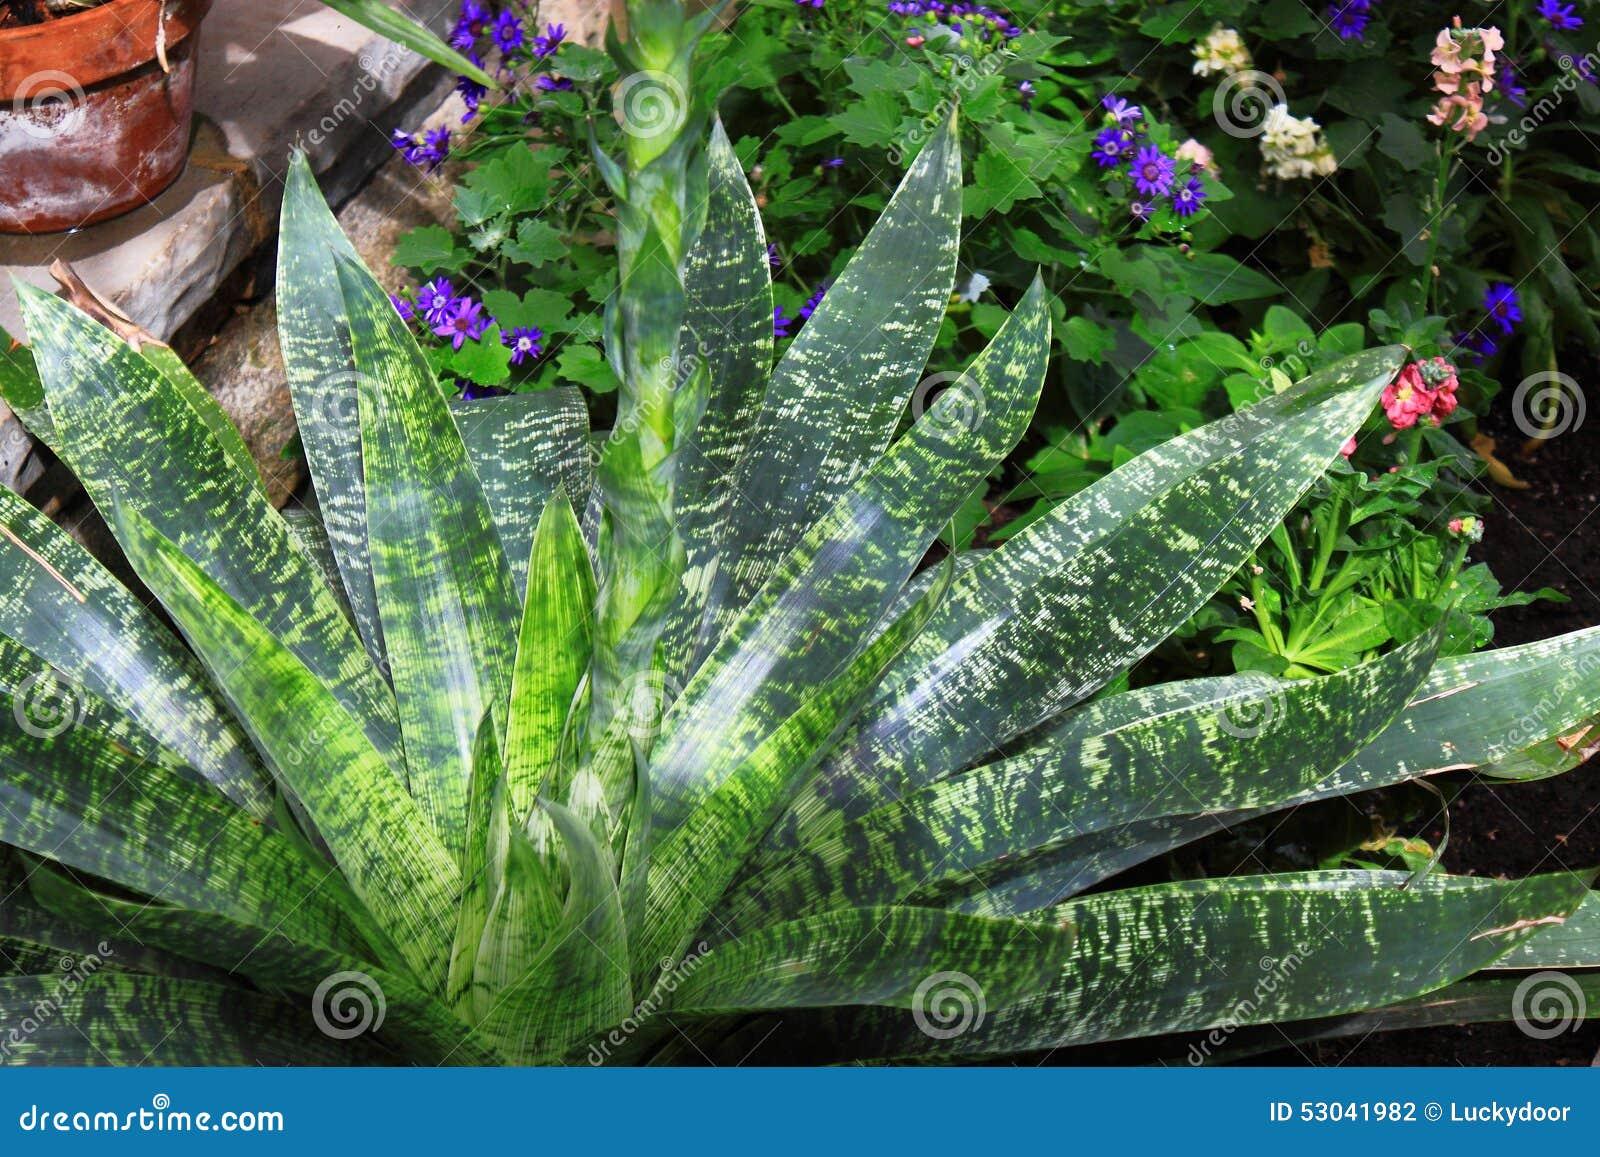 Polaroidübertragung des Kaktus